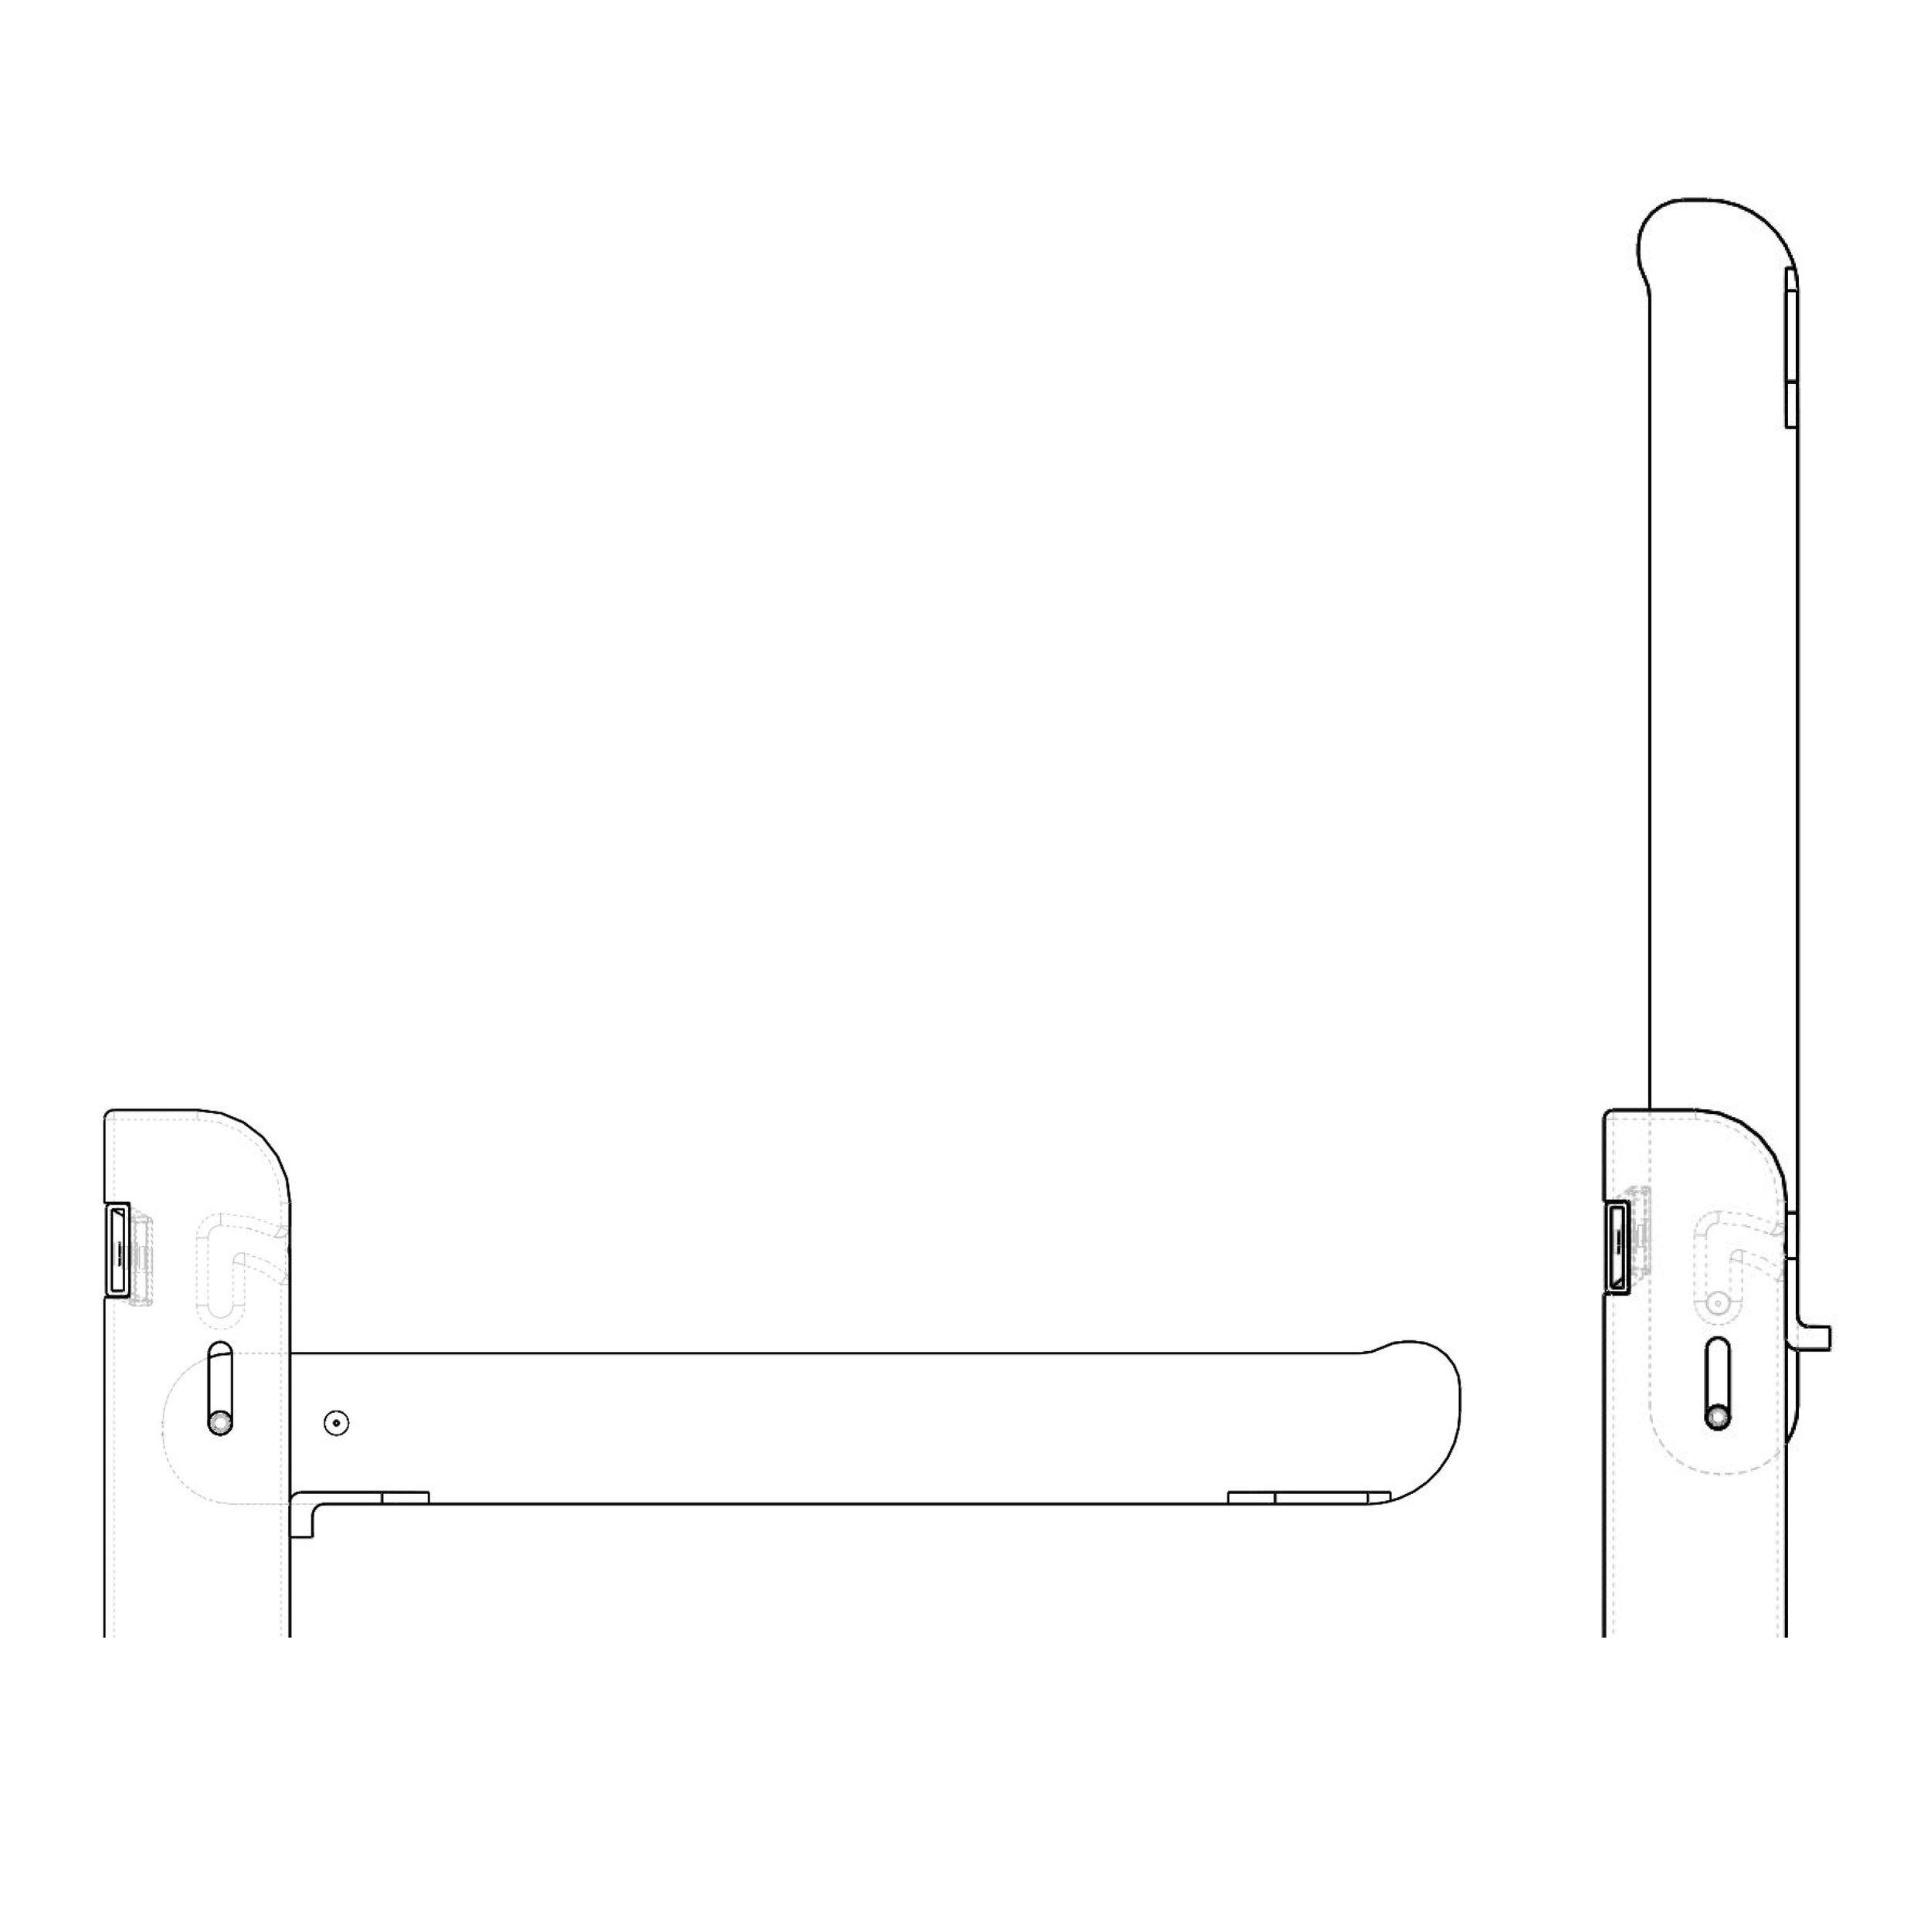 Pin & Slot Bracket Mechanism